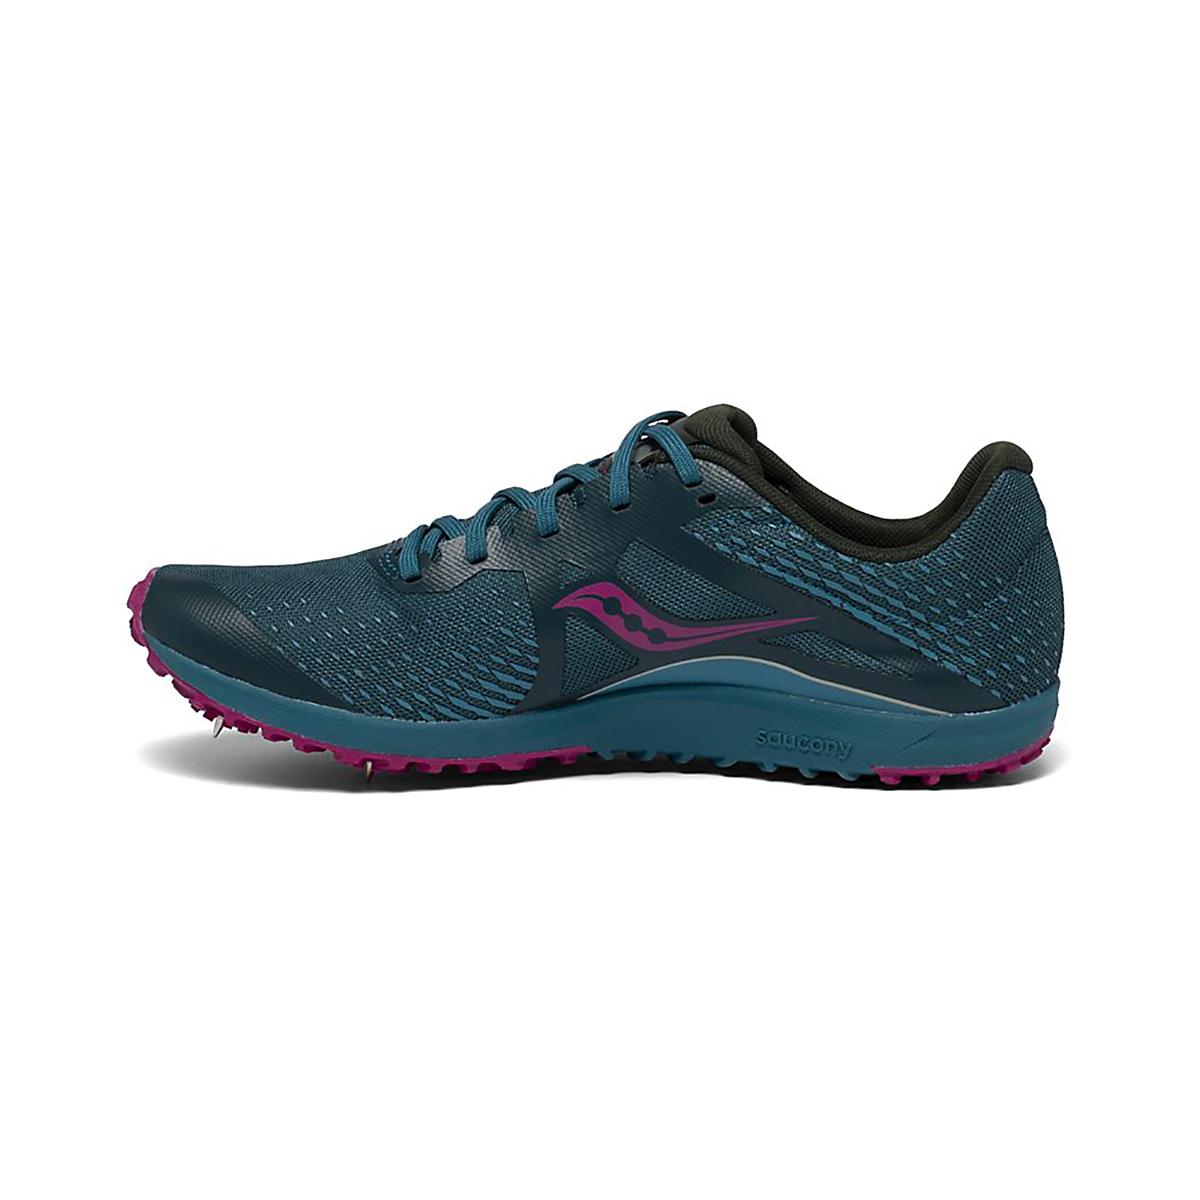 Women's Saucony Kilkenny XC8 Spike Shoes - Color: Marine - Size: 5 - Width: Regular, Marine, large, image 2